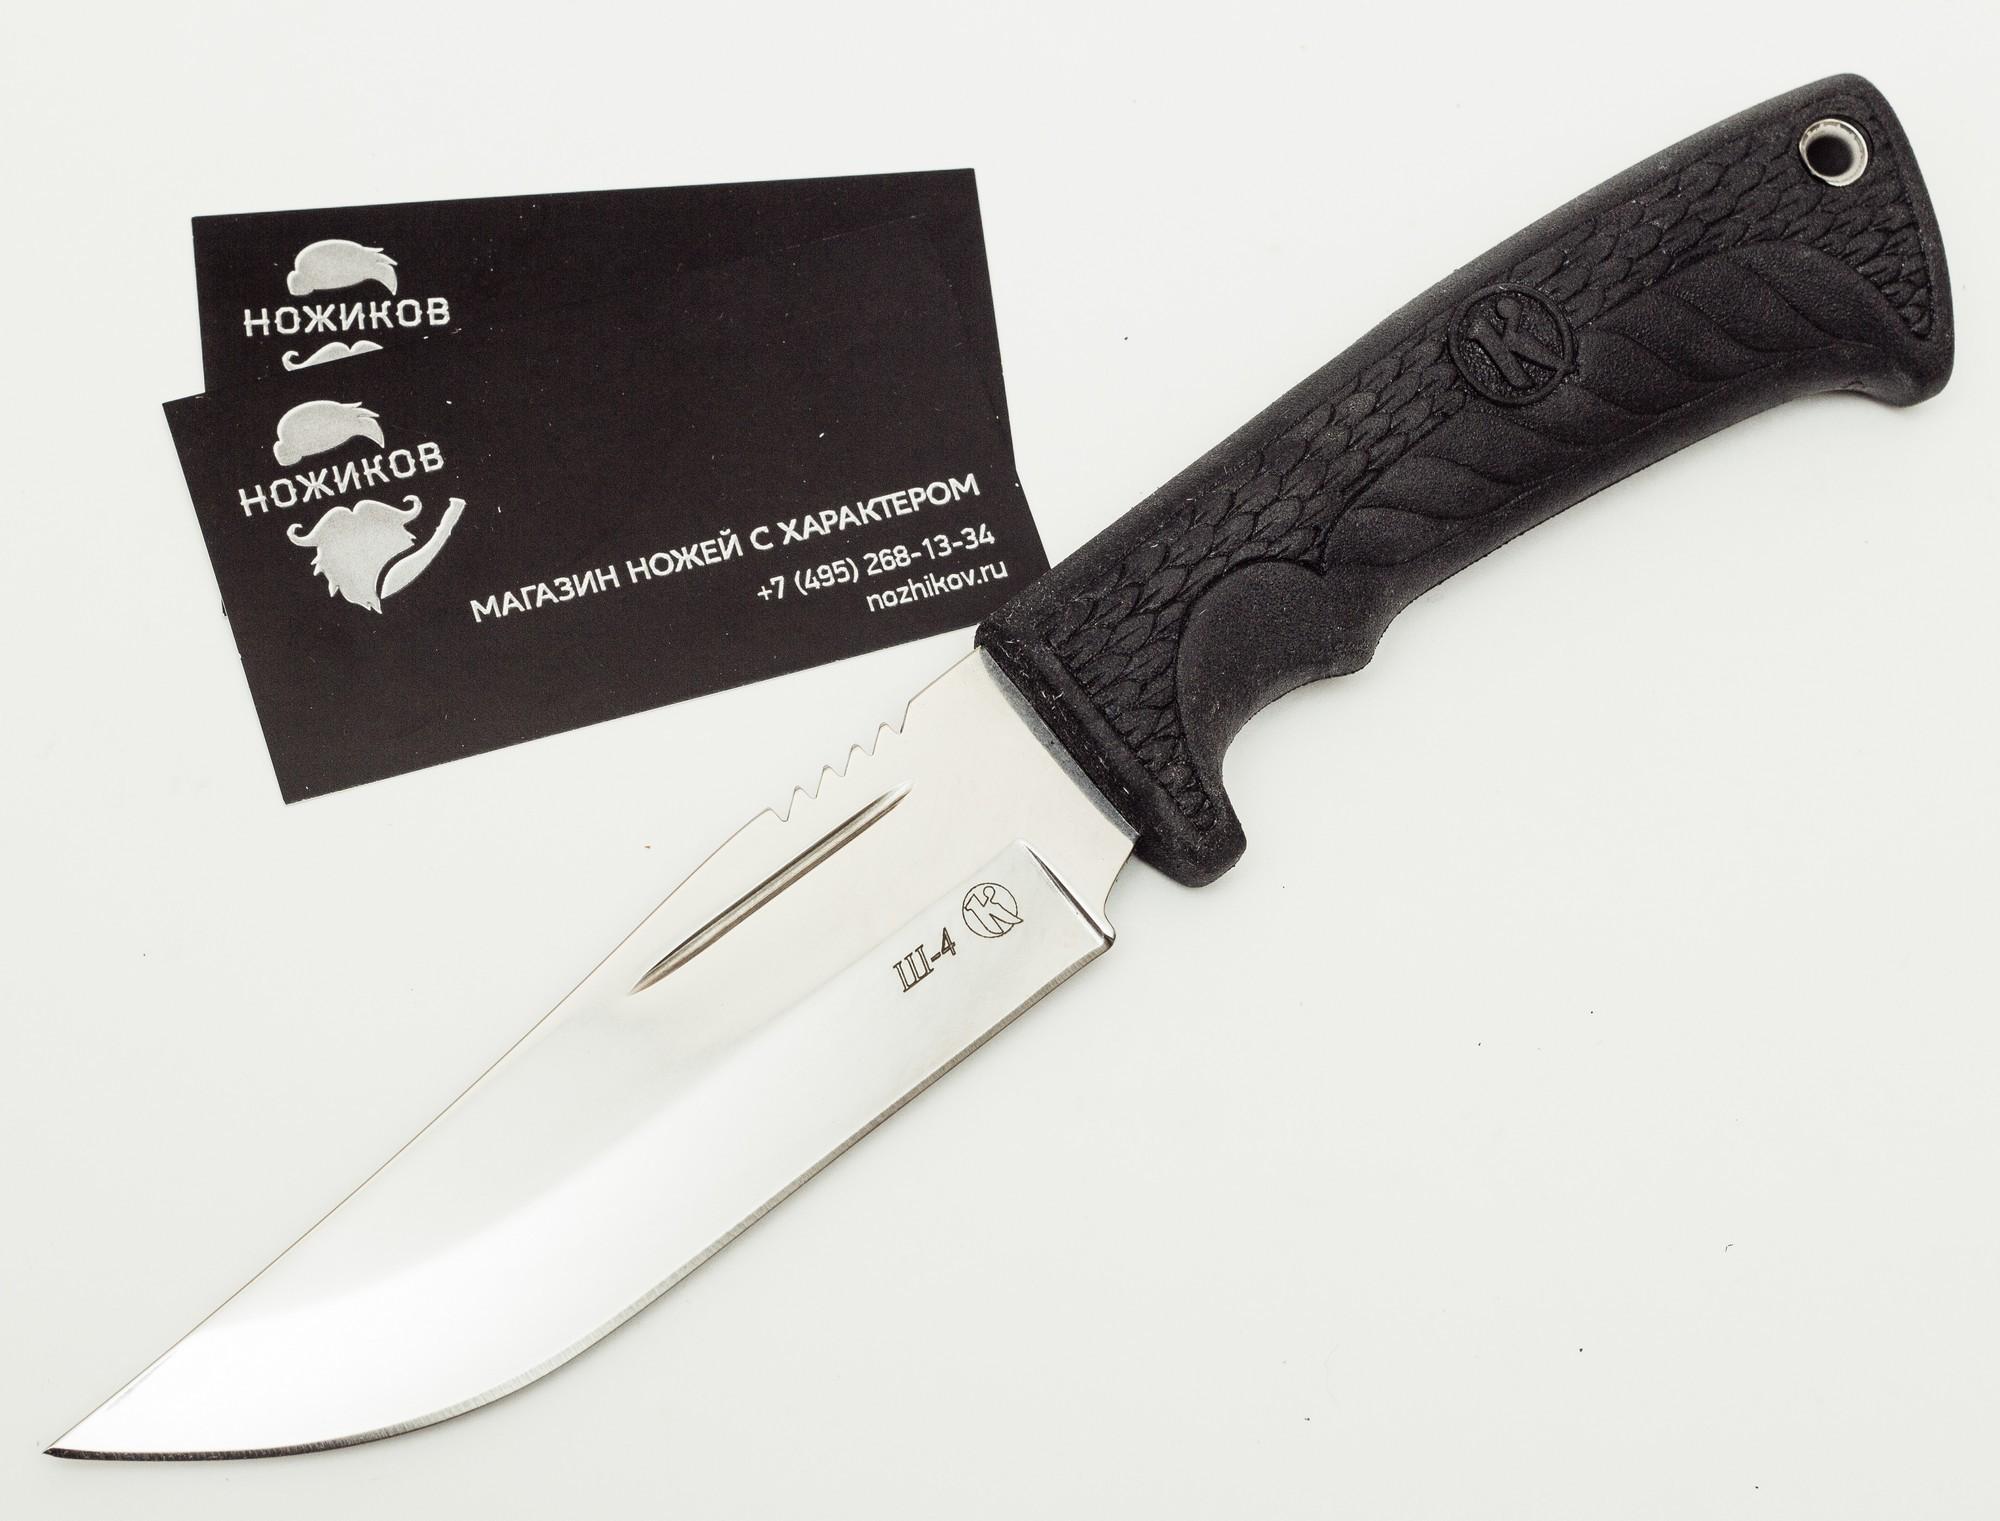 Нож Ш-4 Z160, Кизляр нож тур кизляр